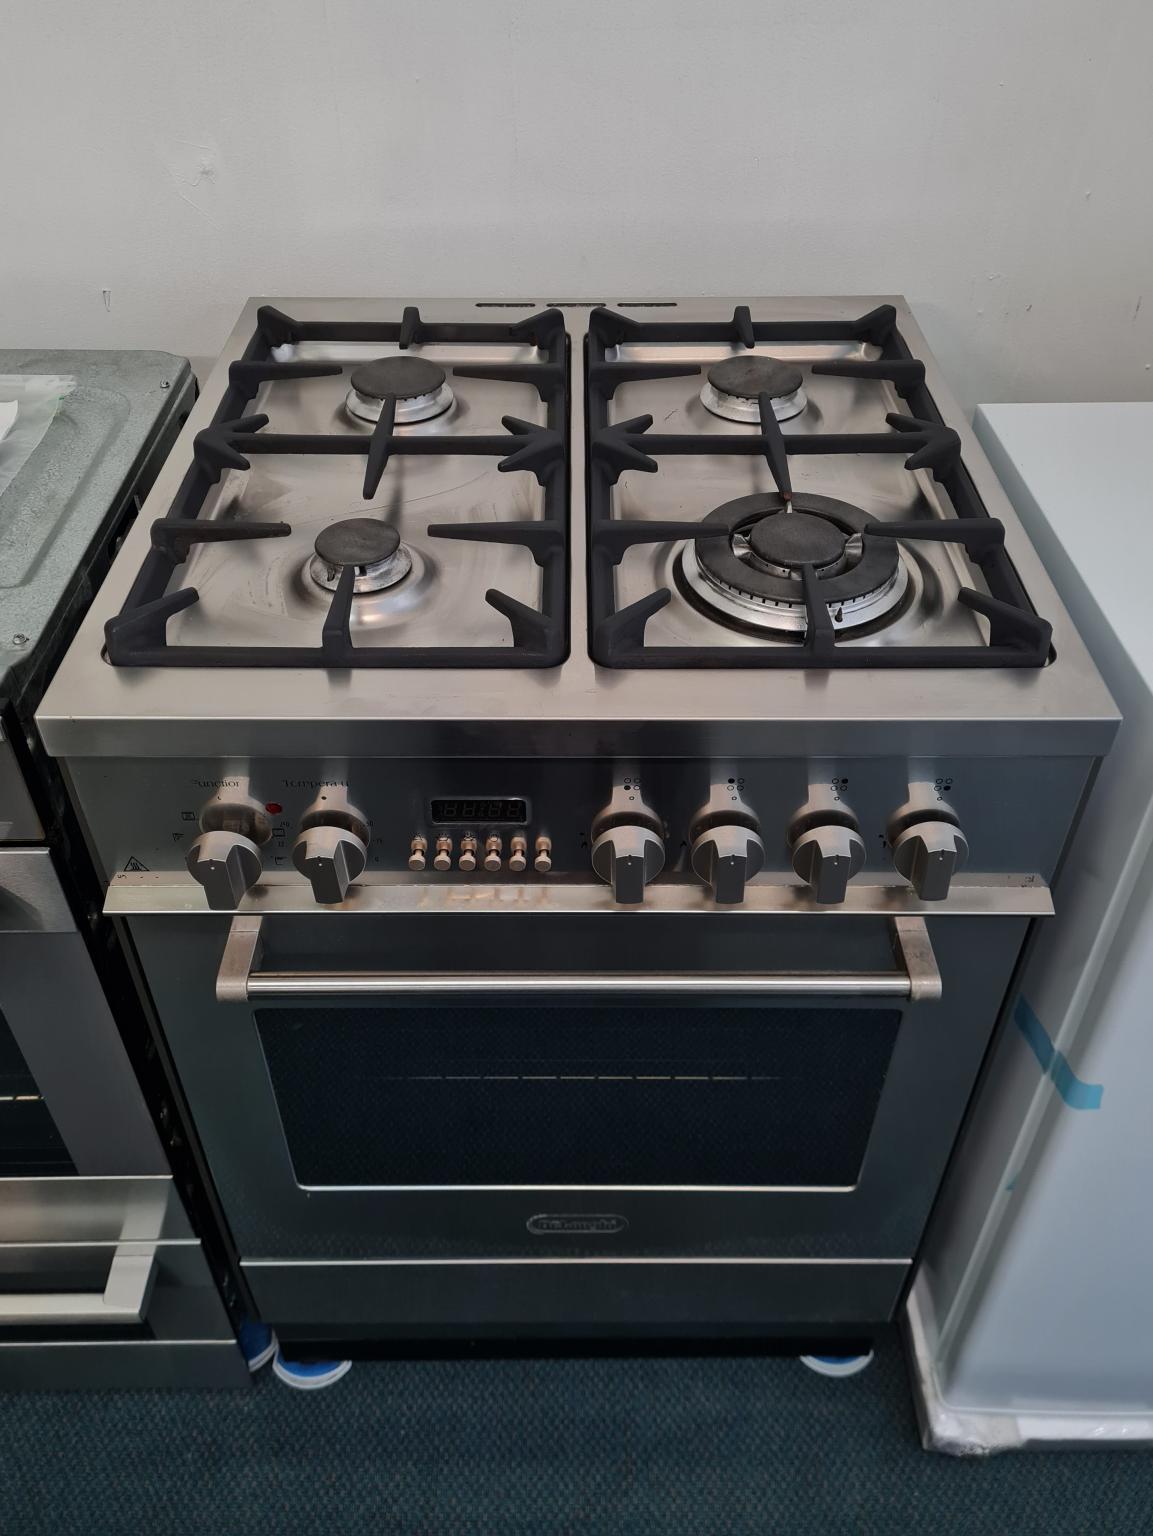 Delonghi 60cm Stainless Steel Duel Fuel Cooker DS61GW